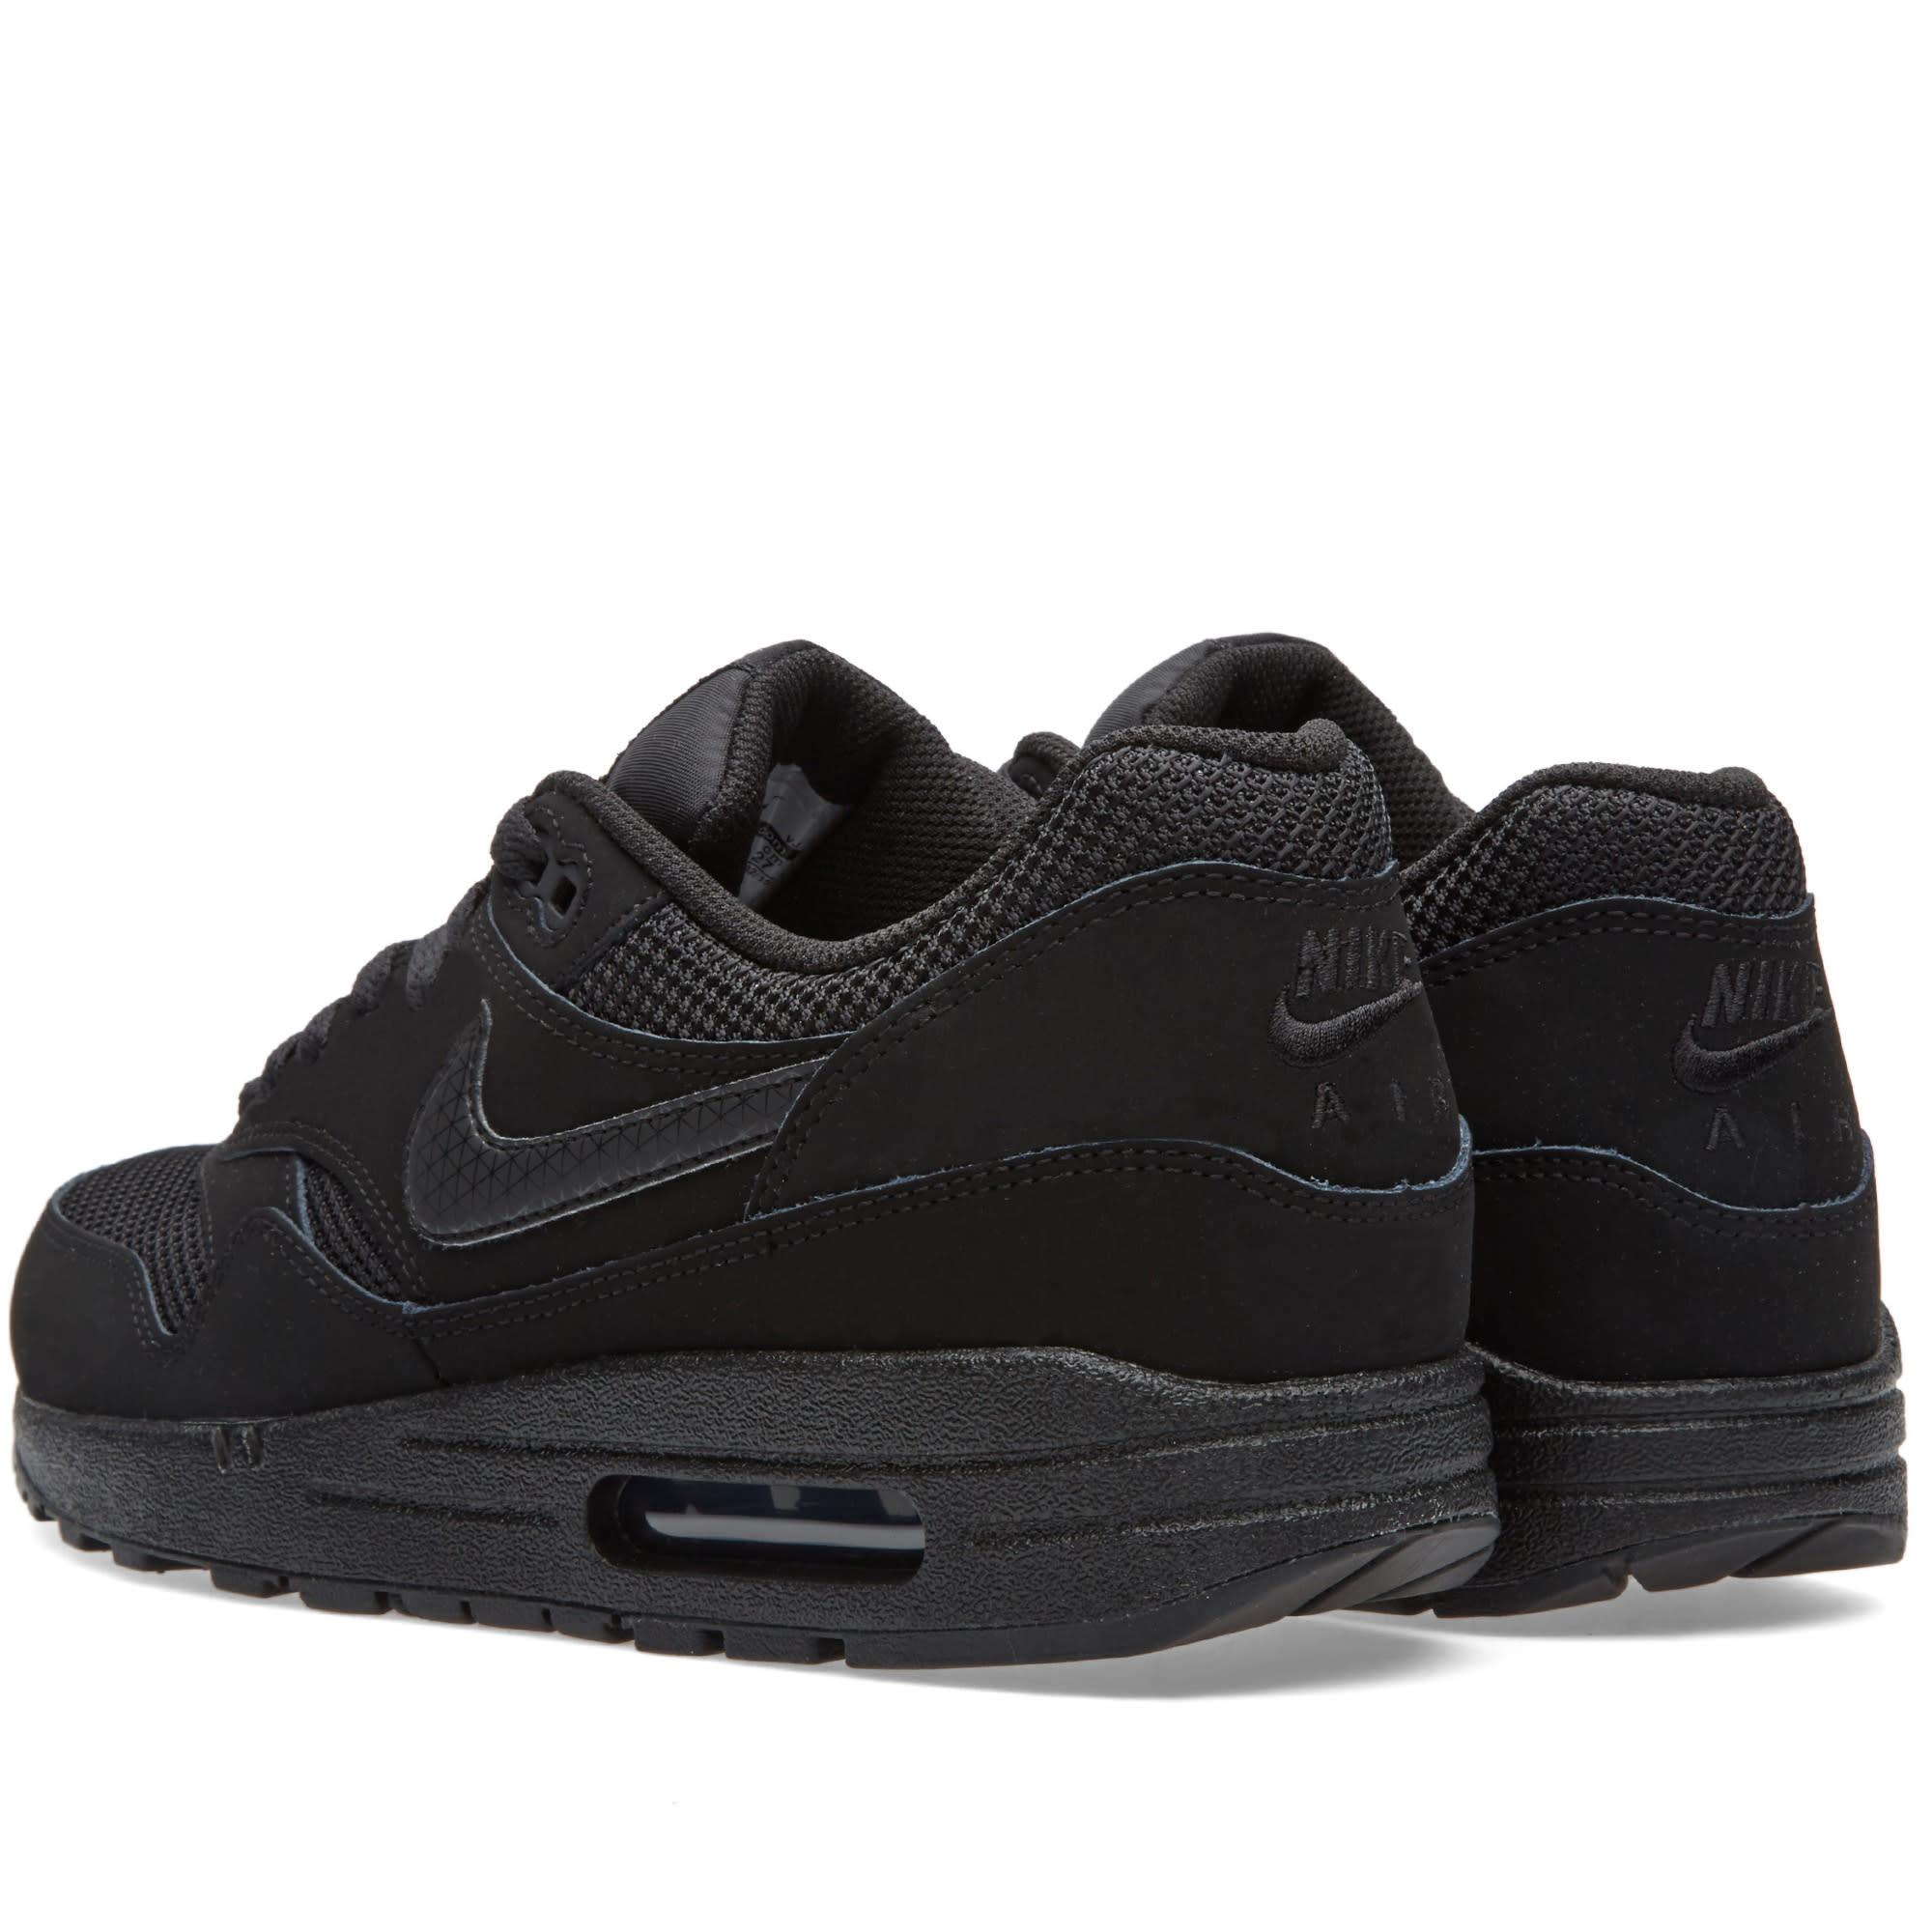 Nike Air Max 1 Essential Svart Svart 537383 025 Inköp